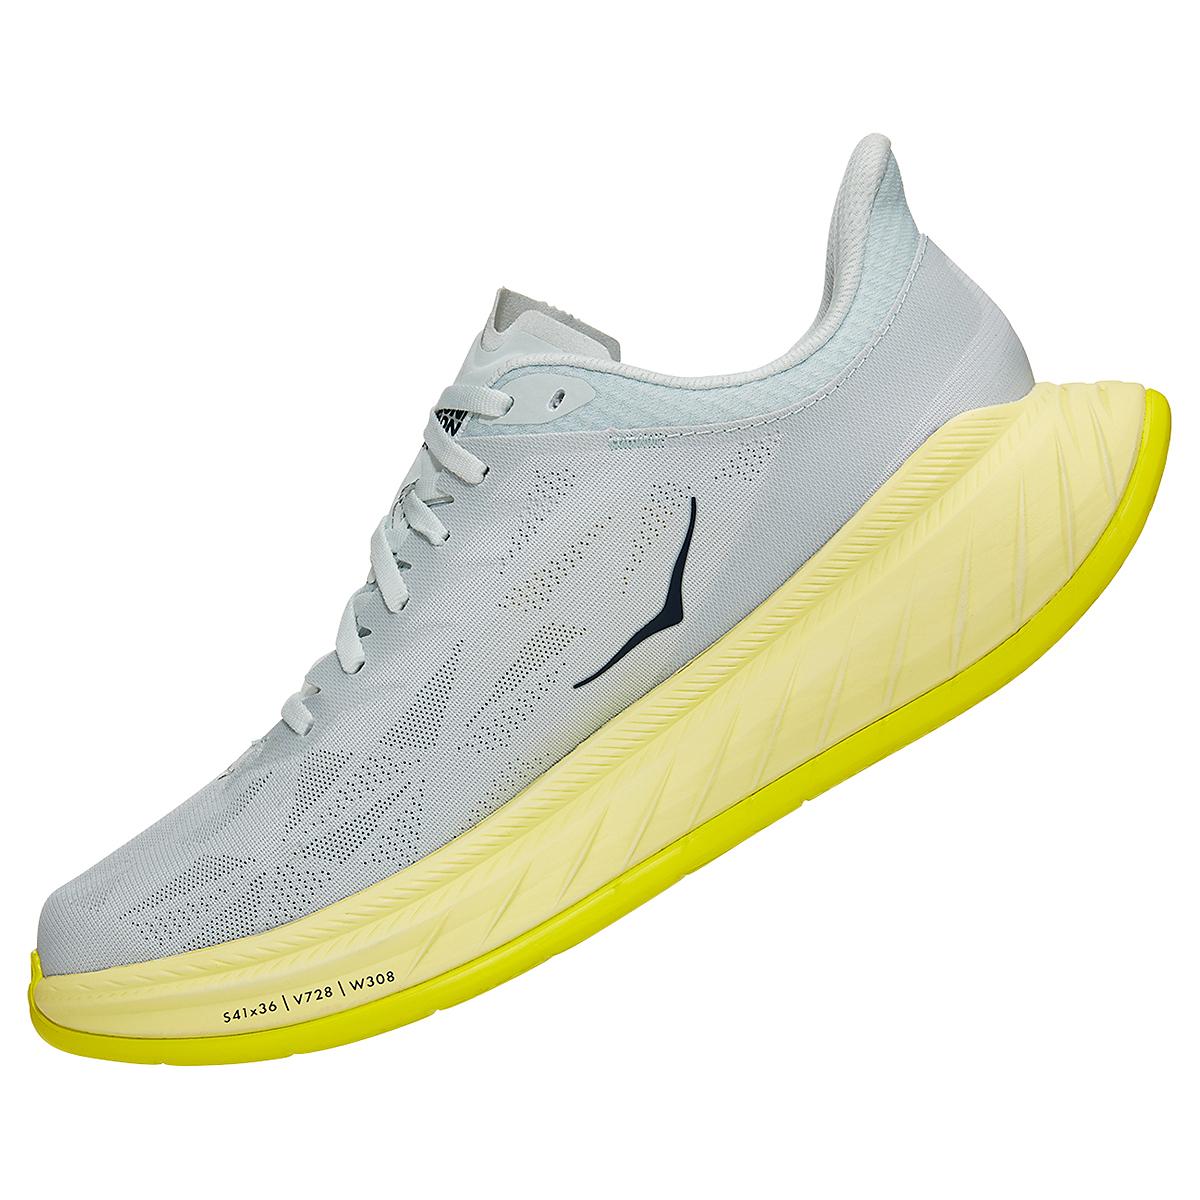 Men's Hoka One One Carbon X 2 Running Shoe - Color: Blue Flower/Luminary Green - Size: 7 - Width: Regular, Blue Flower/Luminary Green, large, image 4